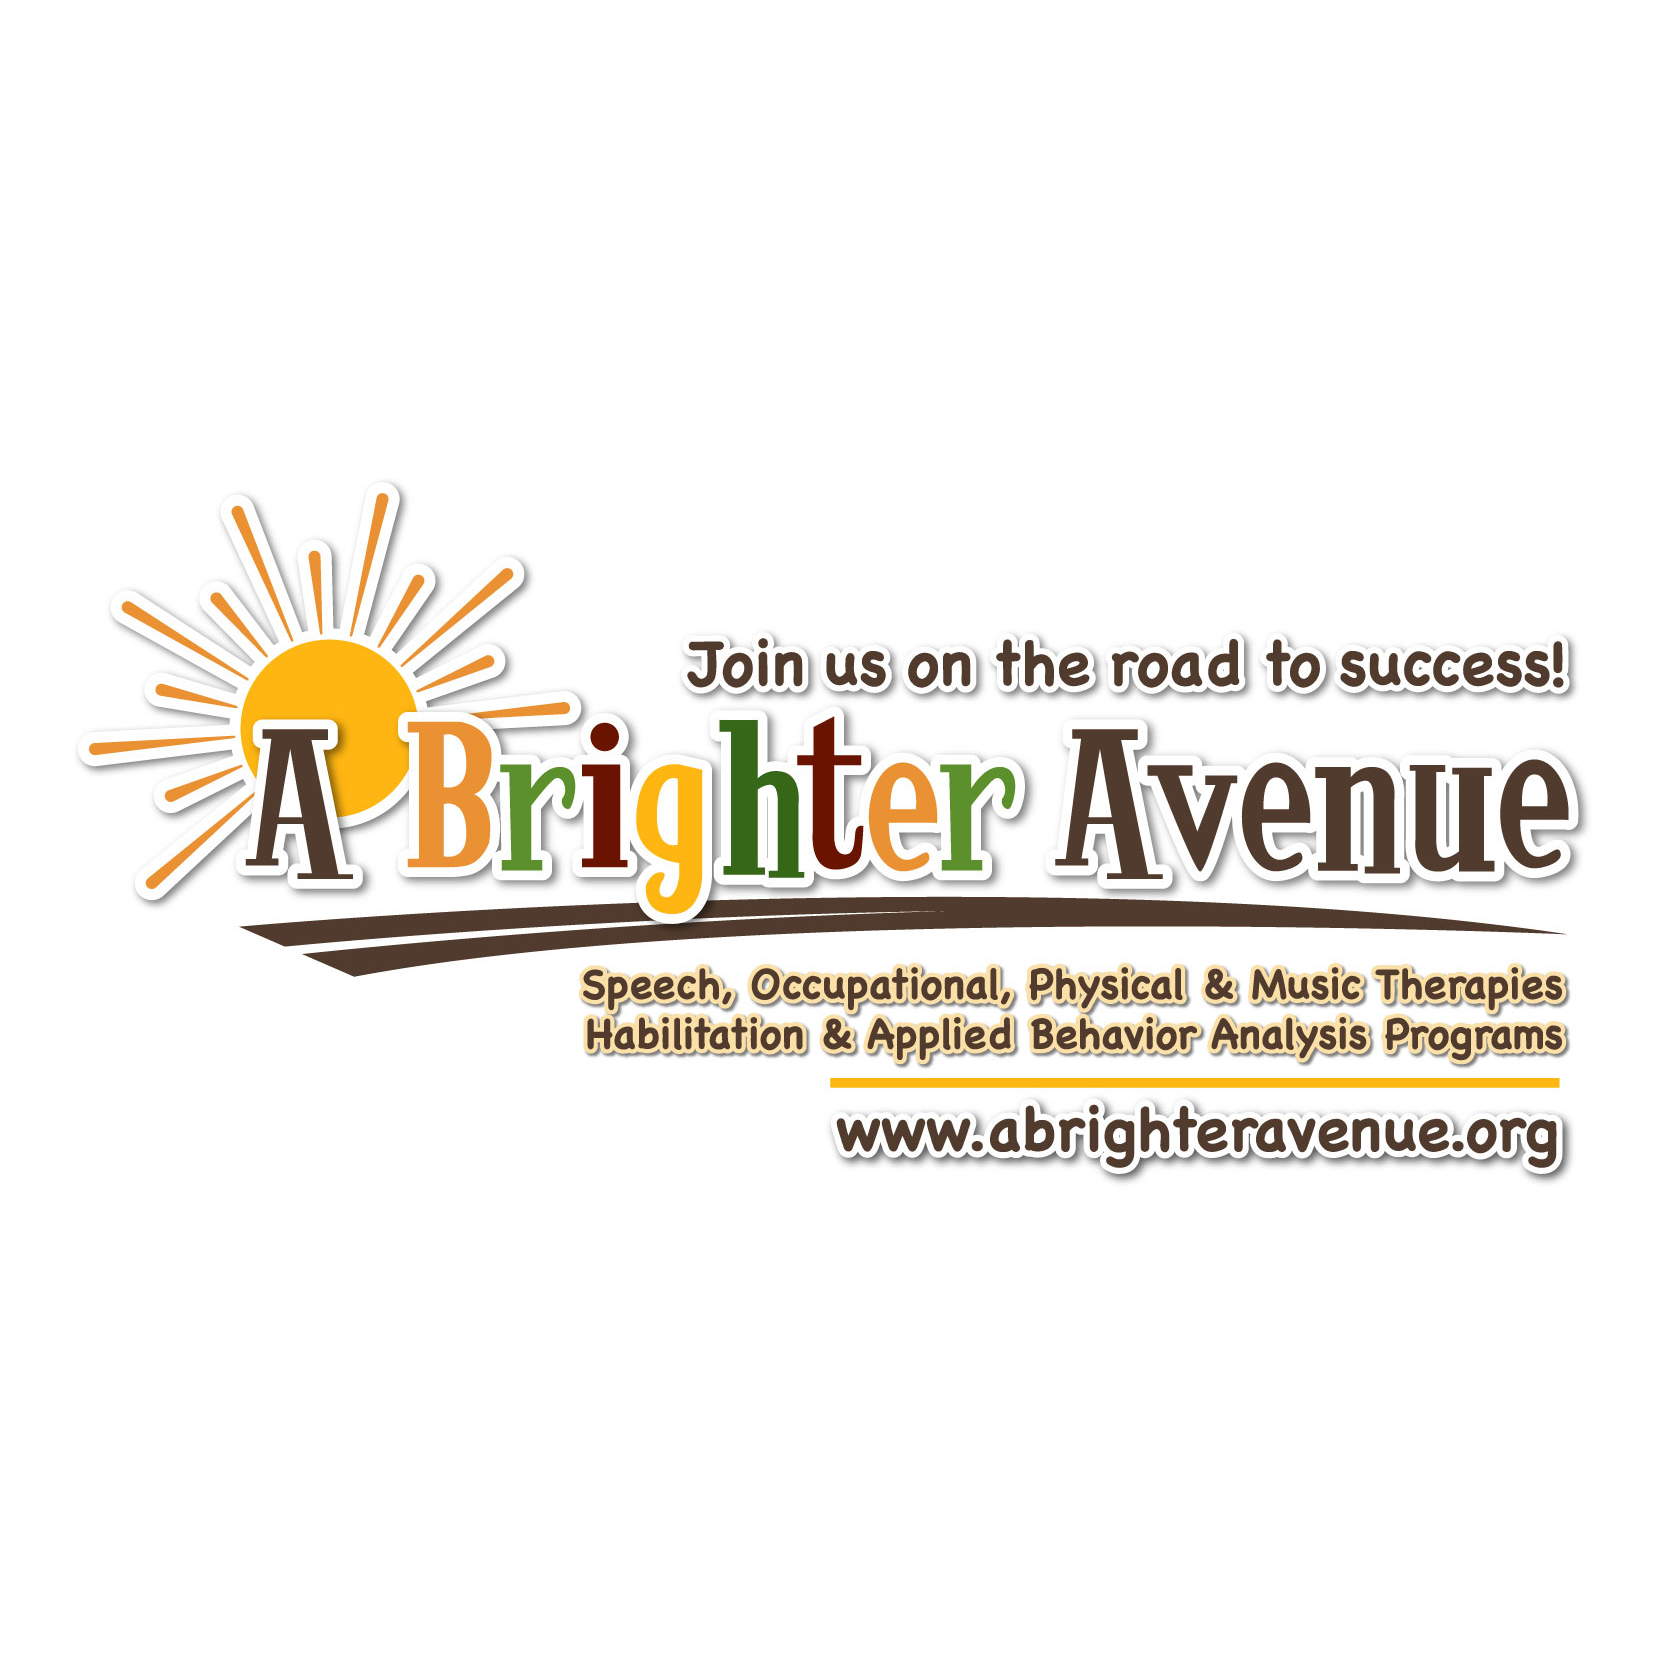 A Brighter Avenue LLC